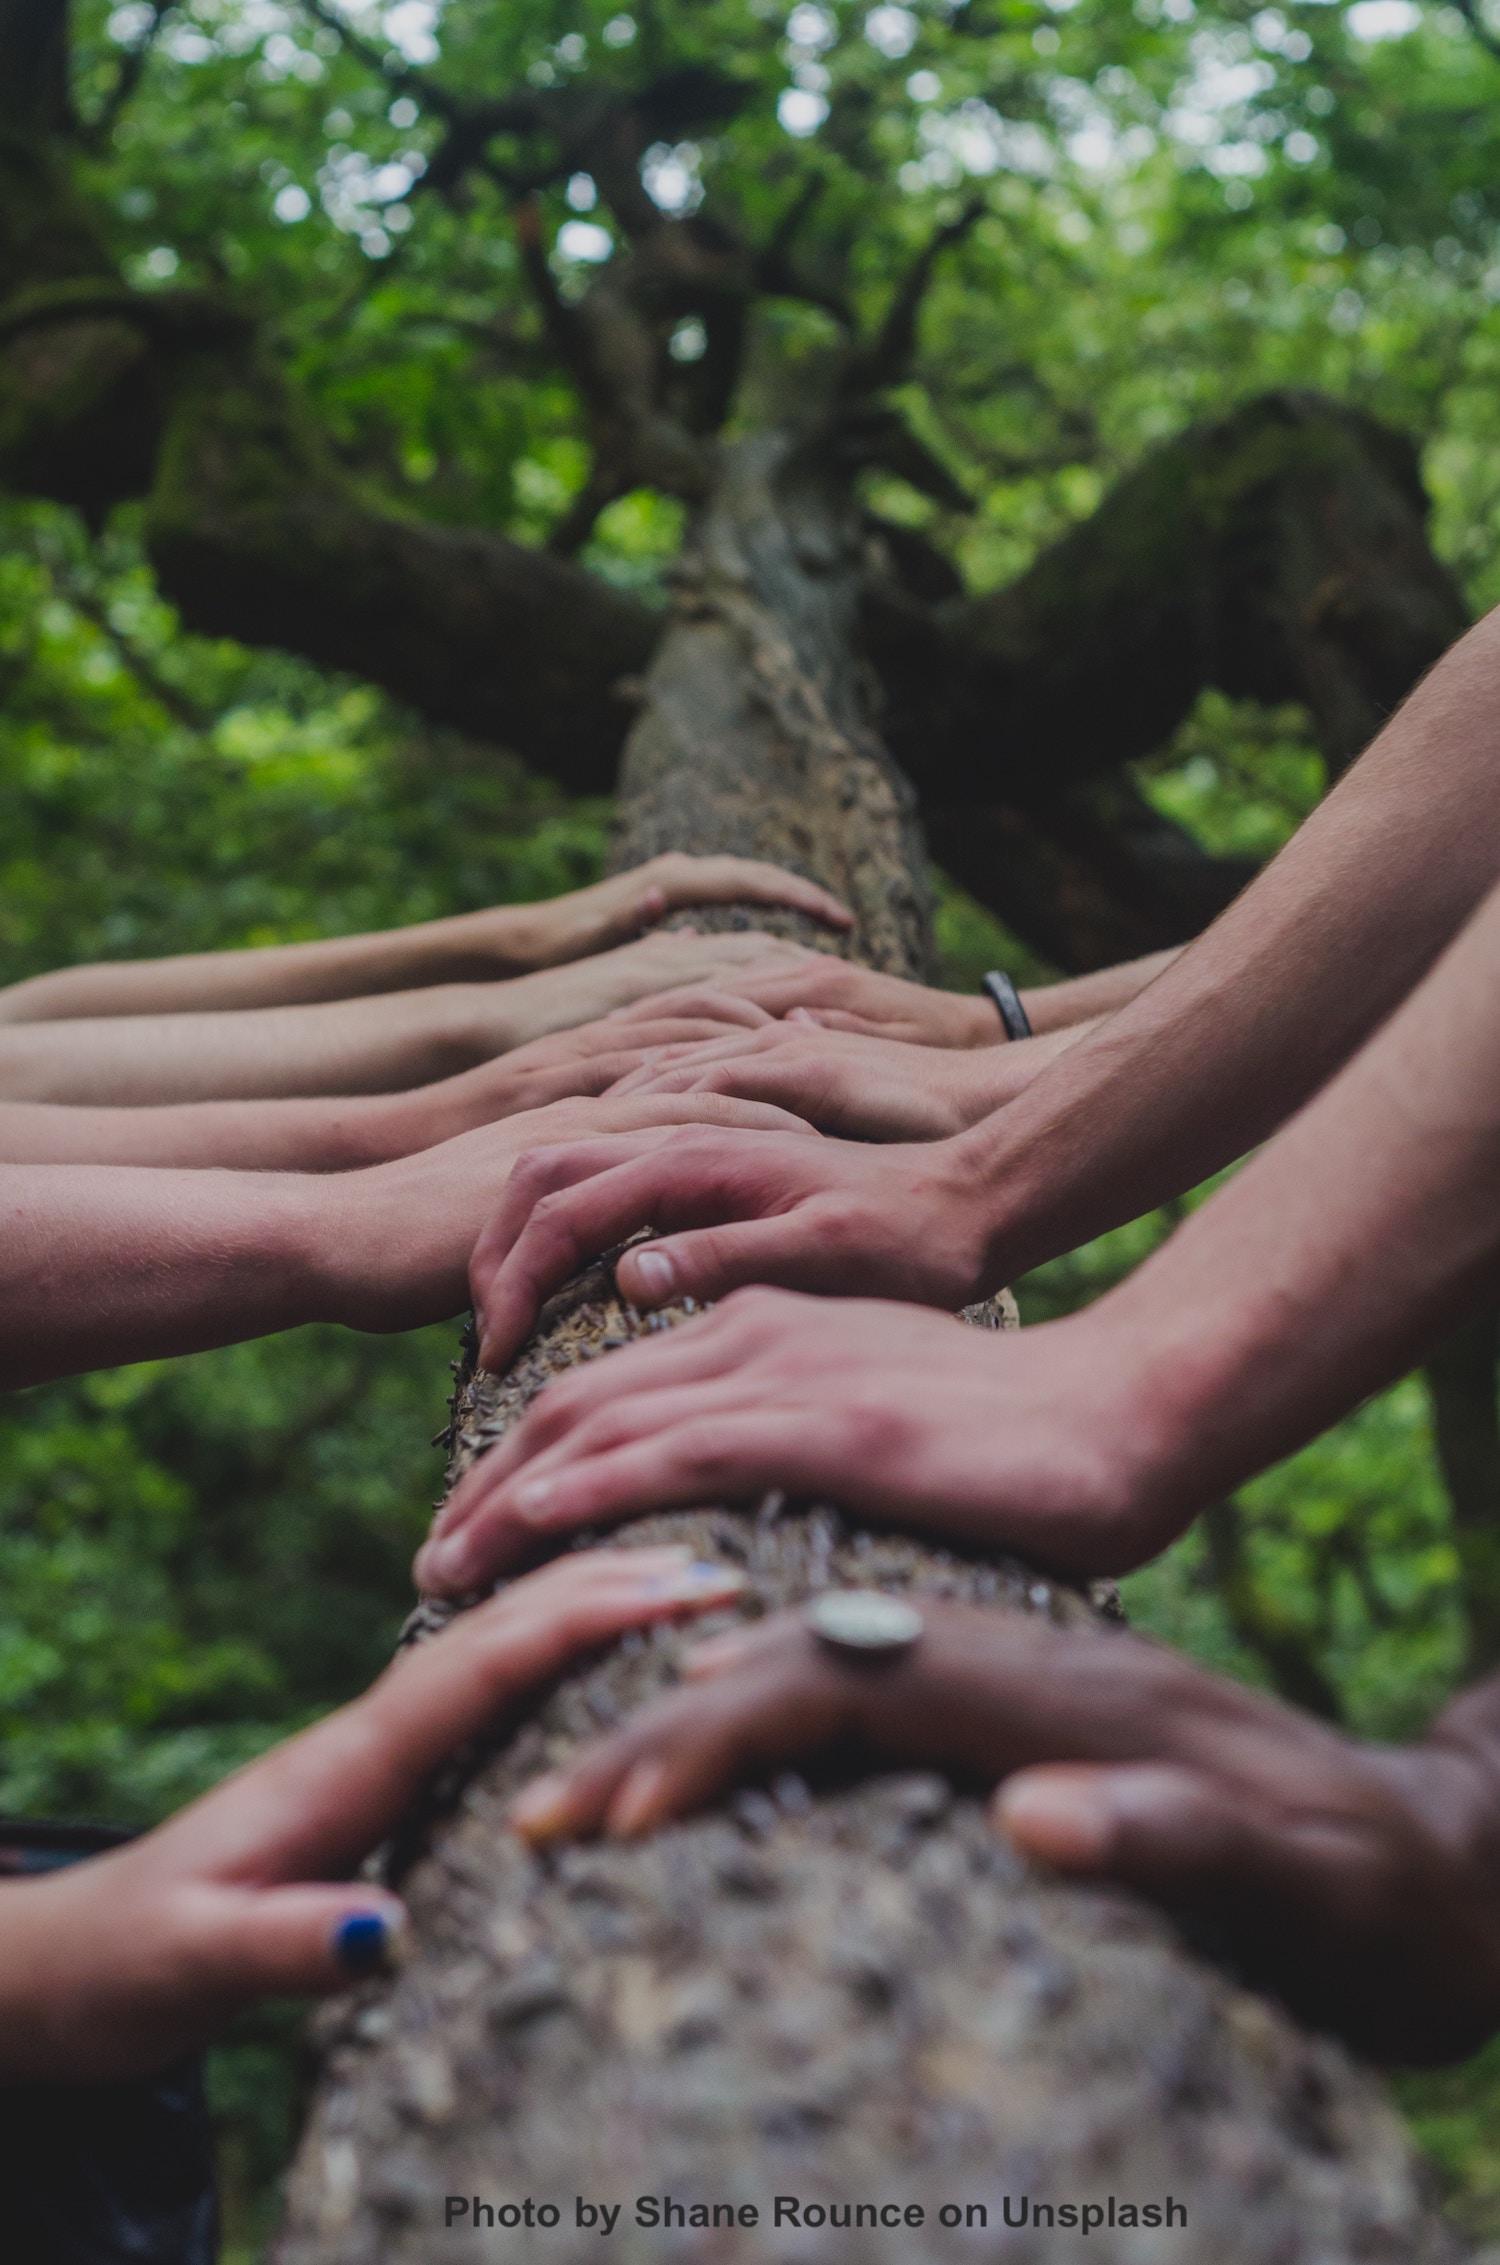 7 of wands, tarot, death, mayan, daykeeper, lamat, creativity, growth, reproduce, potential, healingthroughceremony.com, michele fire-river heart